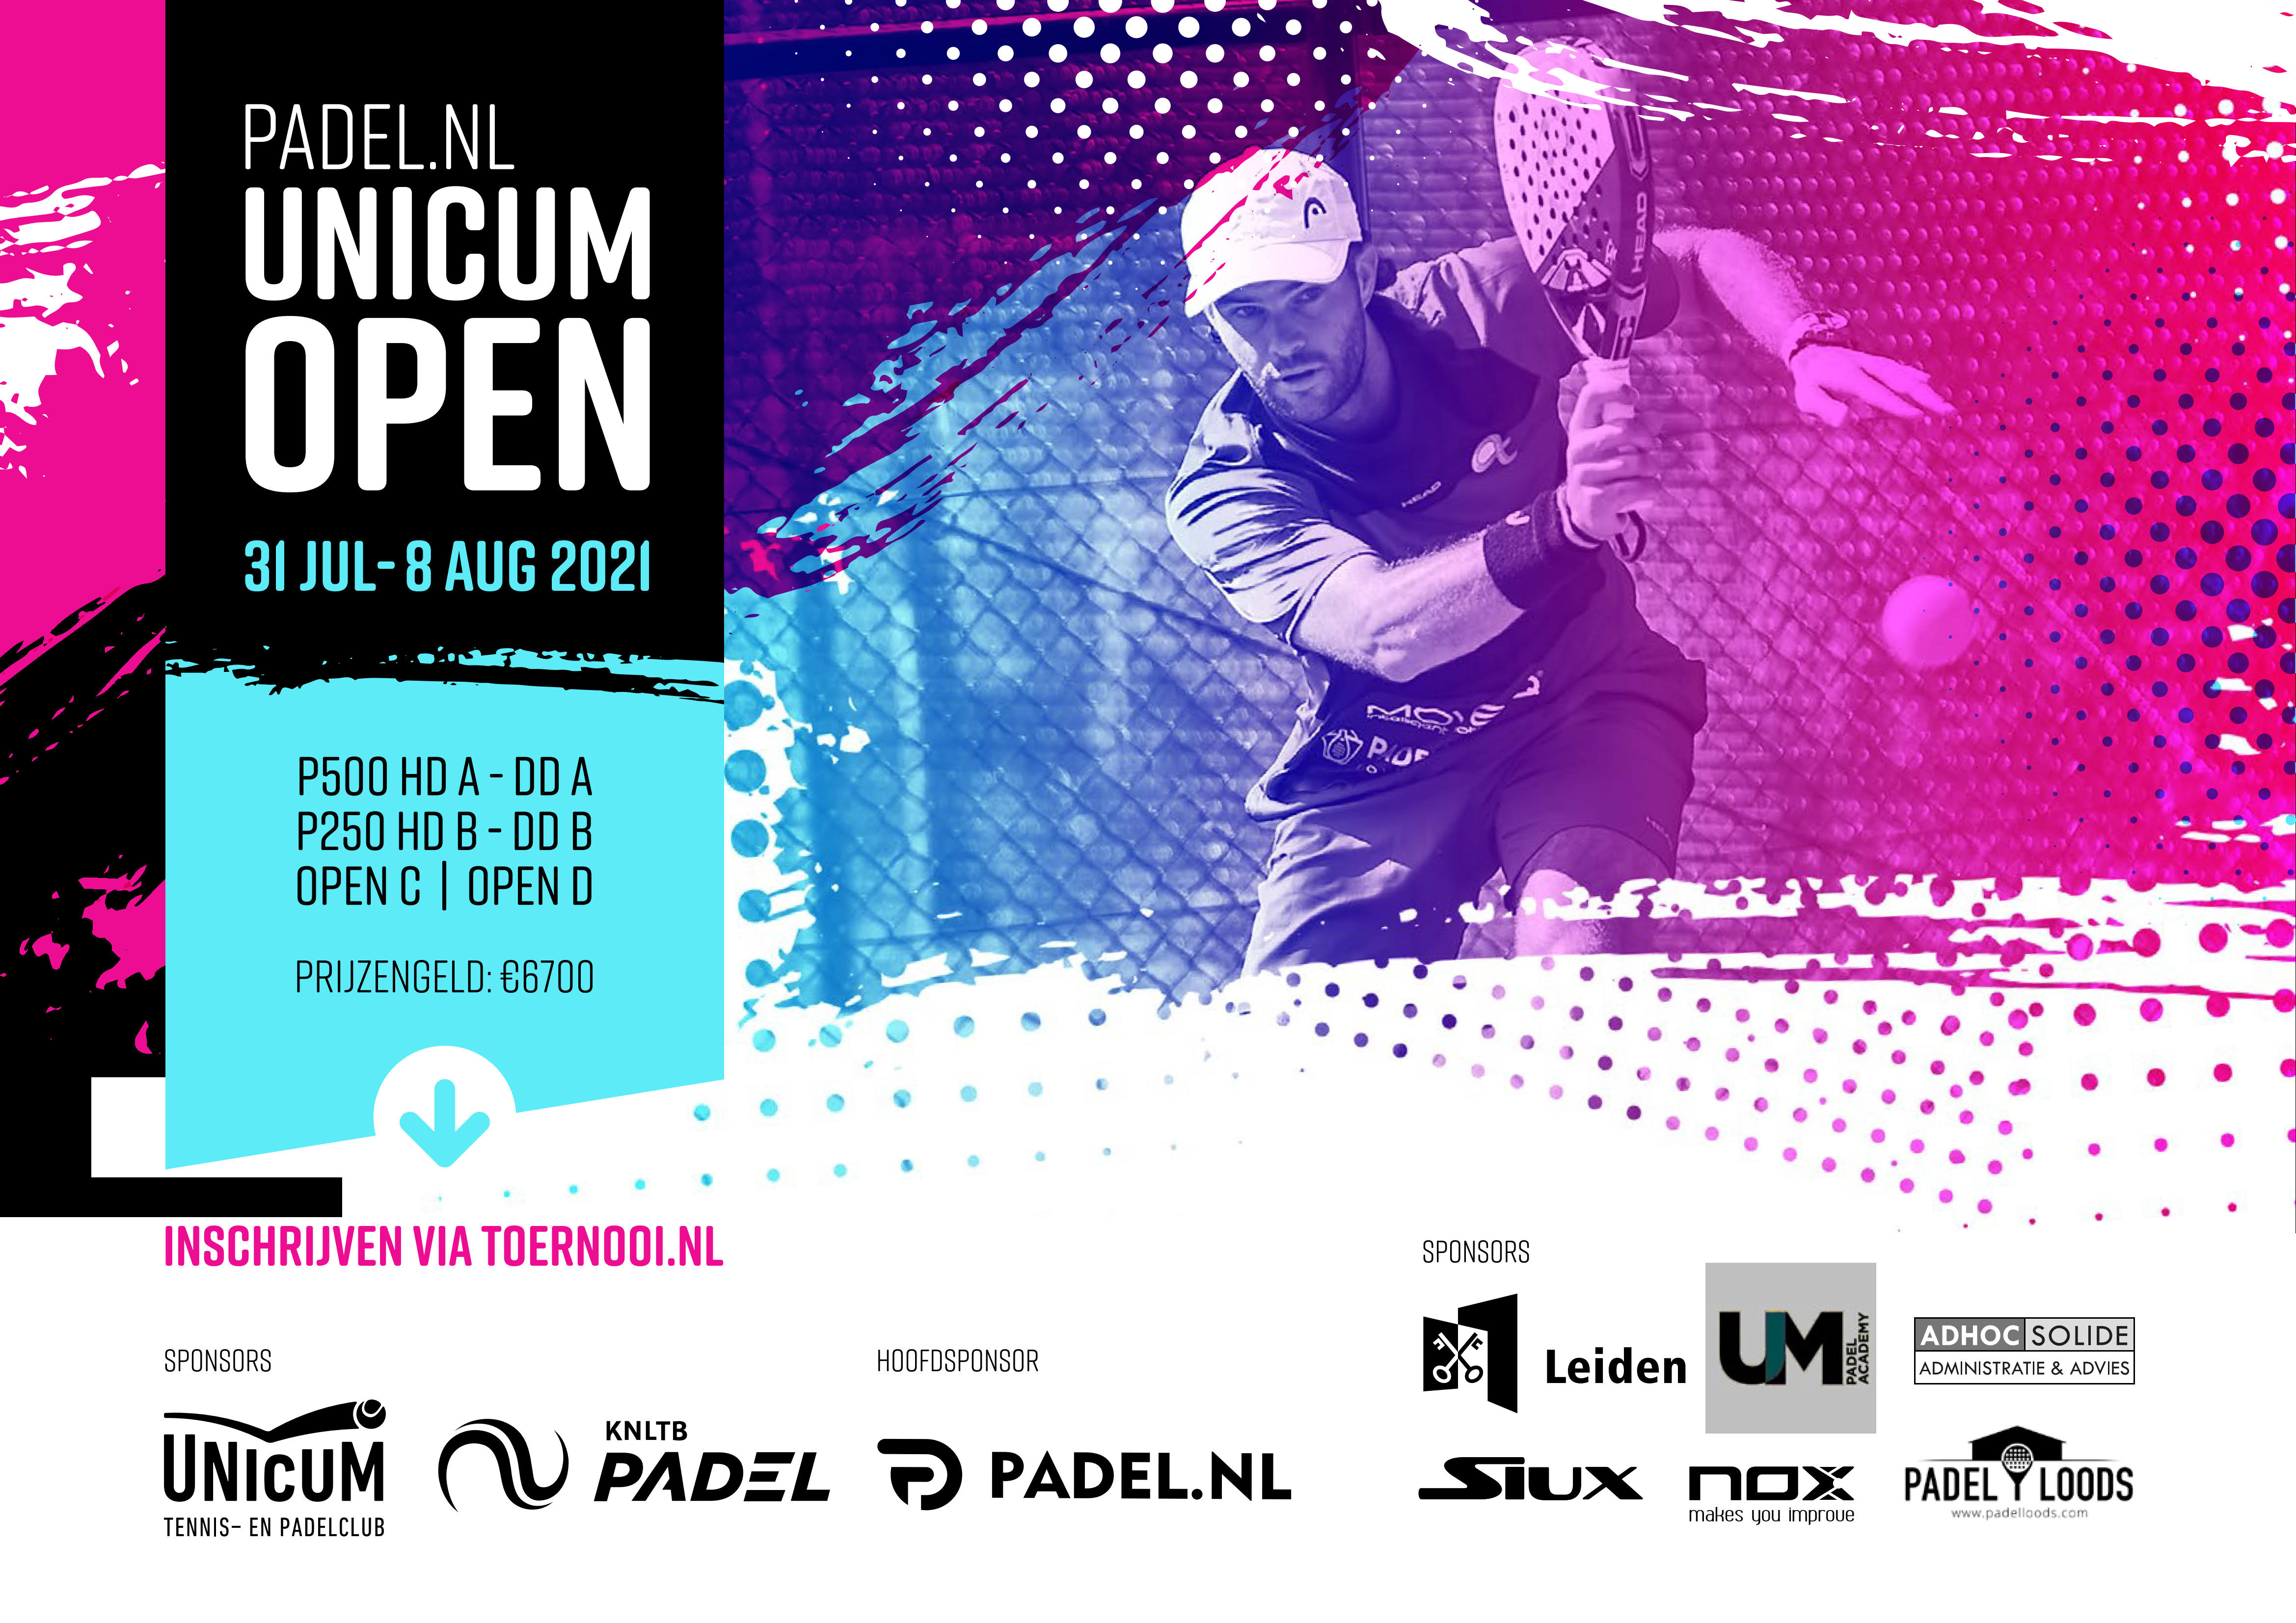 Padel.nl Unicum Open poster